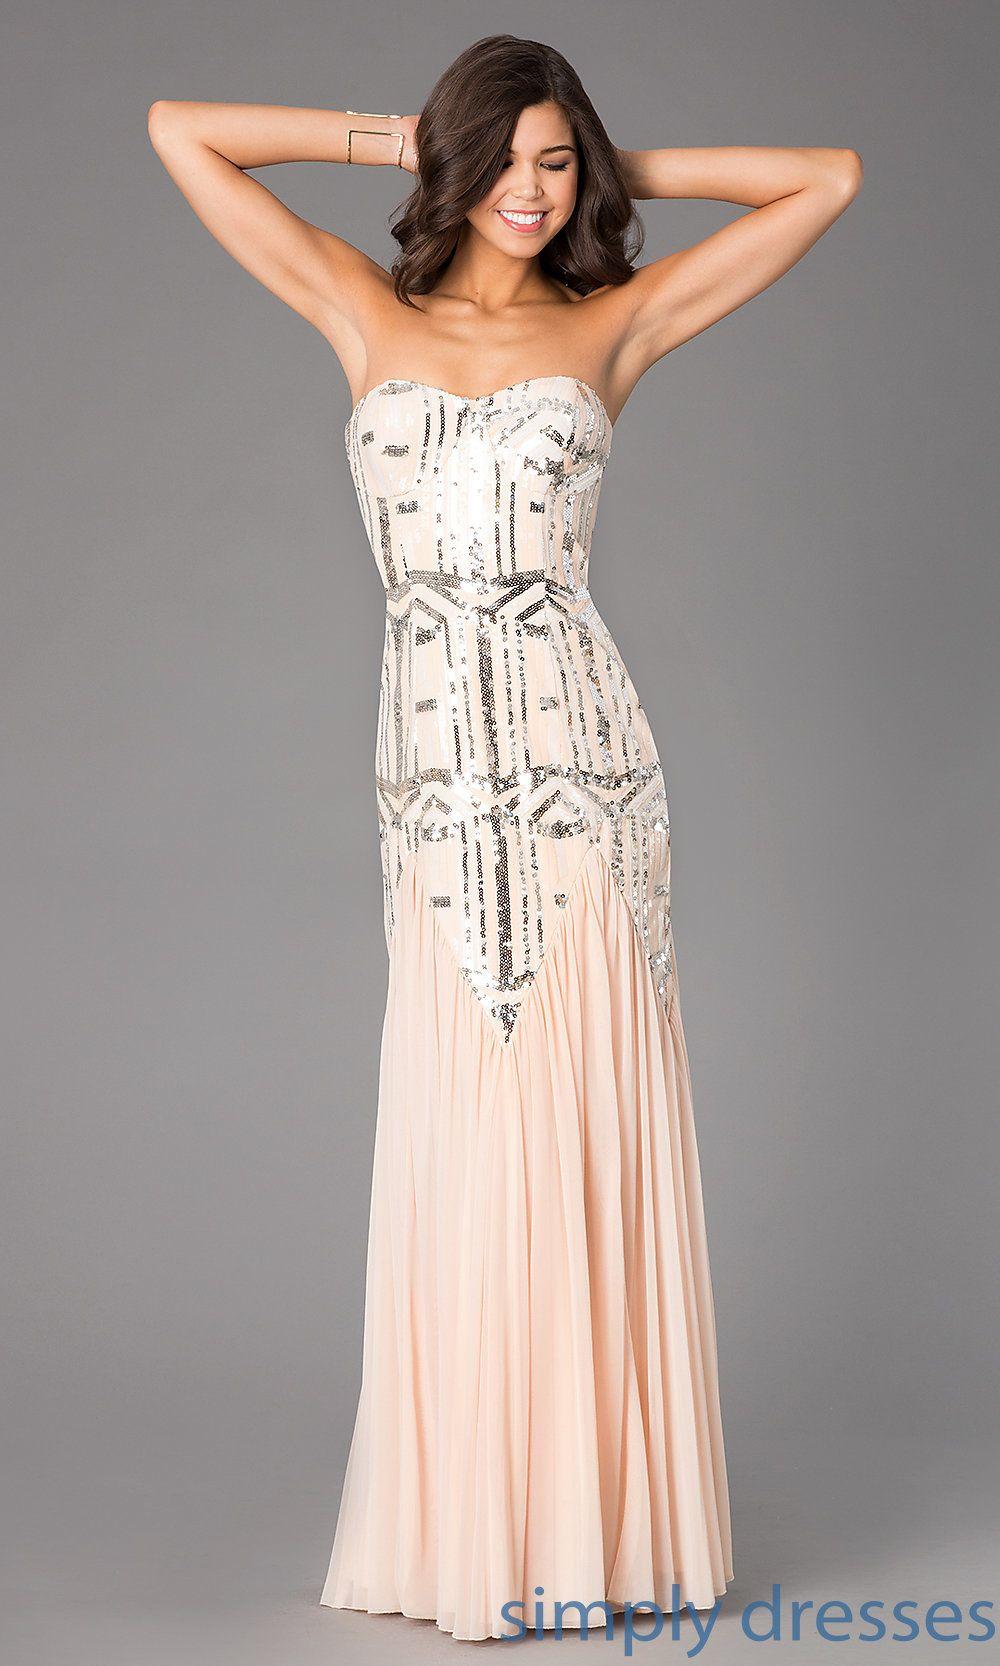 Dress, Strapless Sweetheart Floor Length Dress - Simply Dresses